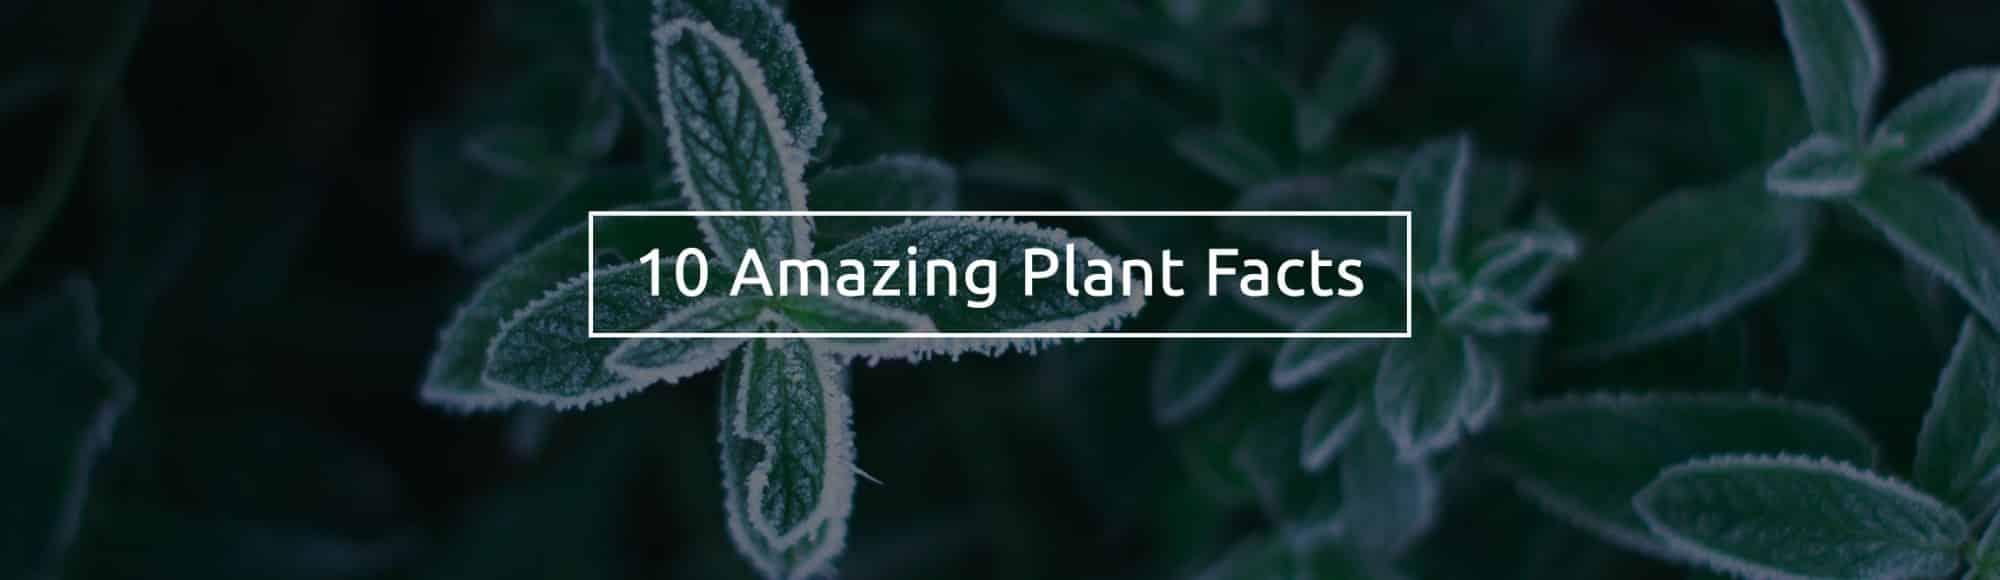 mood-lifting-plant-facts